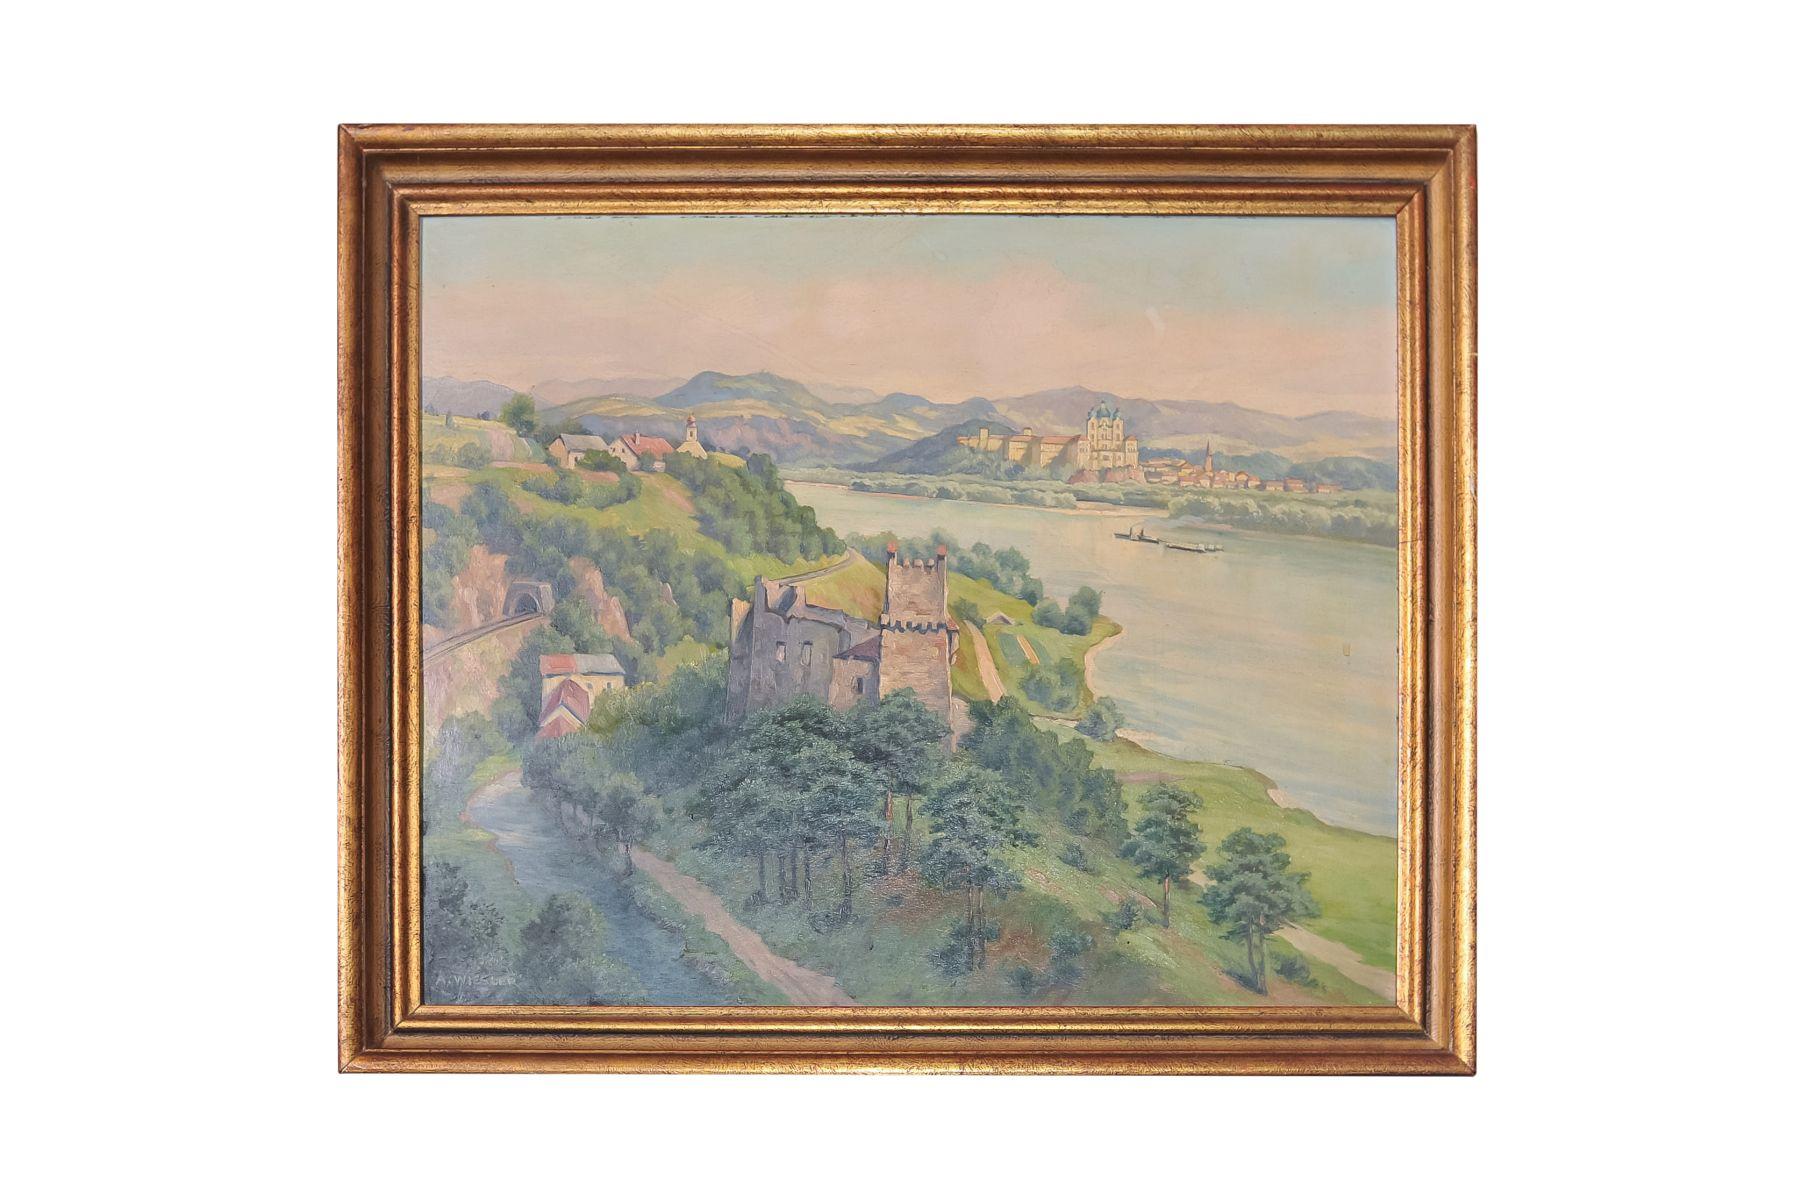 "#98 Adolf Wiesler (1878-1958) ""View Ruin Welteneg to Melk Donau"" | Adolf Wiesler (1878-1958) ""Blick Ruine Welteneg nach Melk Donau"" Image"